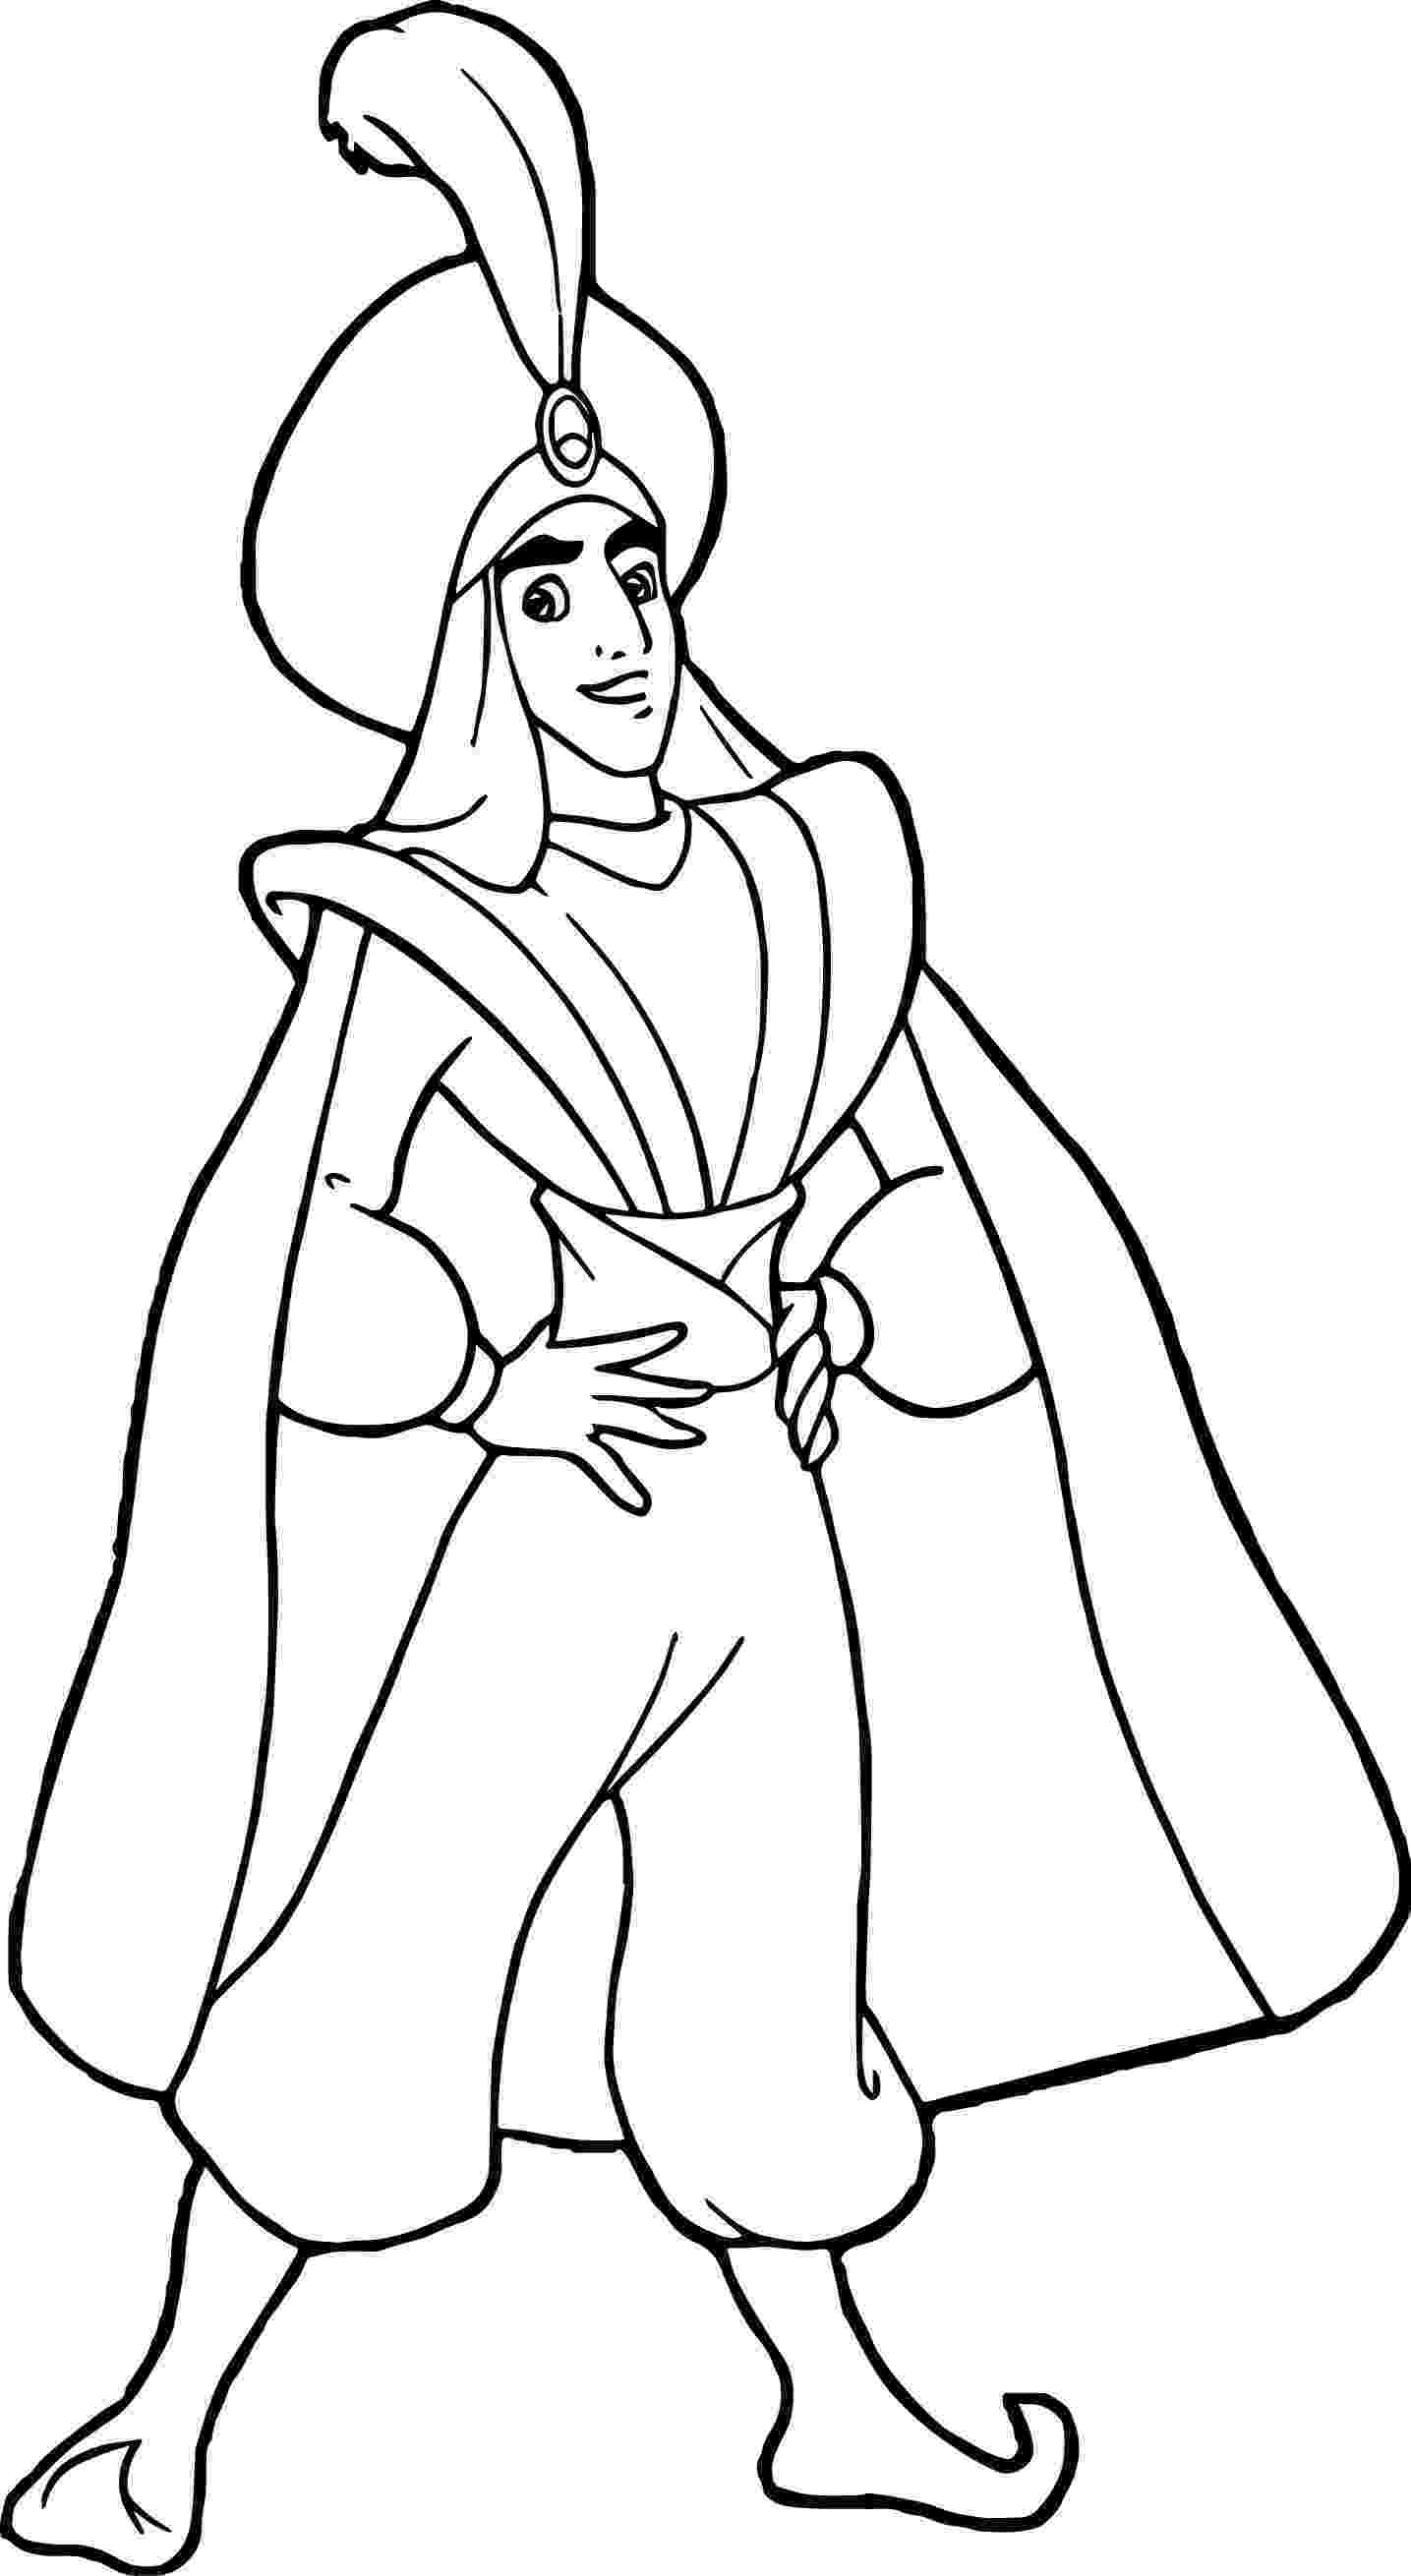 prince colouring cool prince ali aladdin coloring page cartoon coloring prince colouring